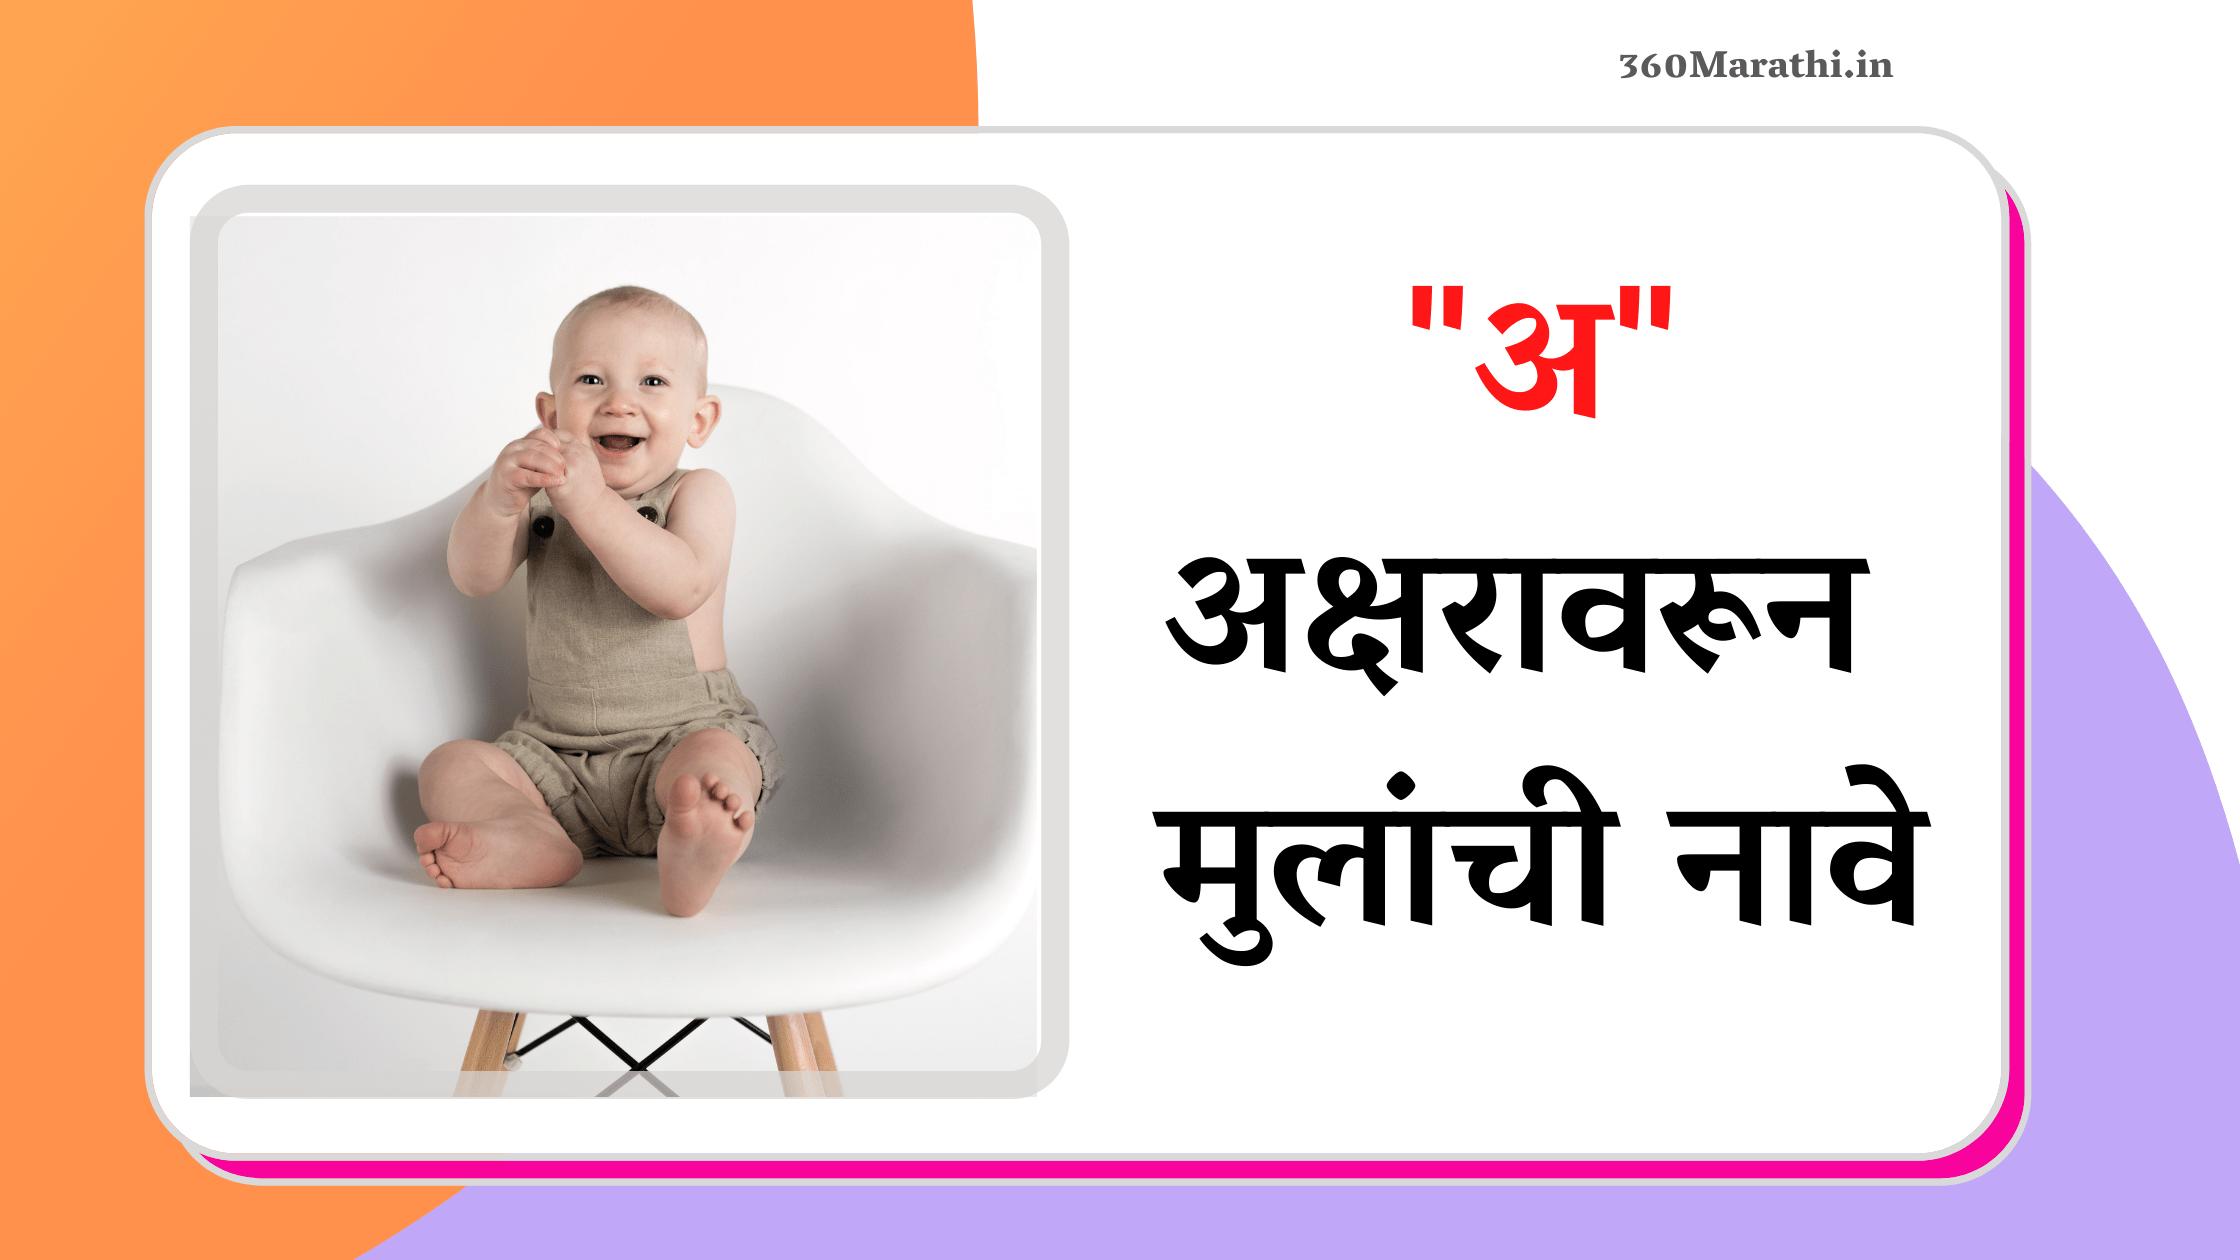 अ अक्षरावरून मुलांची ५०० नावं   Best Baby Boy Names Starting From 'A' In Marathi   A Varun Mulanchi Nave